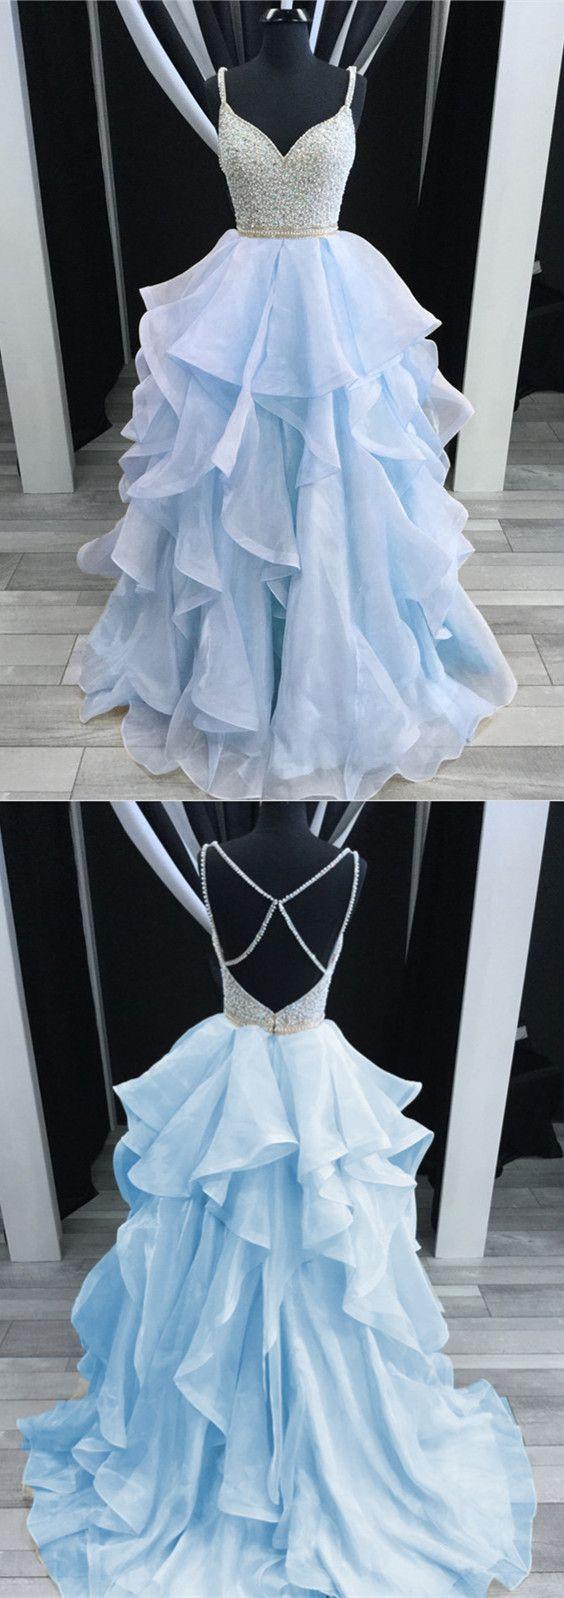 982 best prom dresses 2018 images on Pinterest